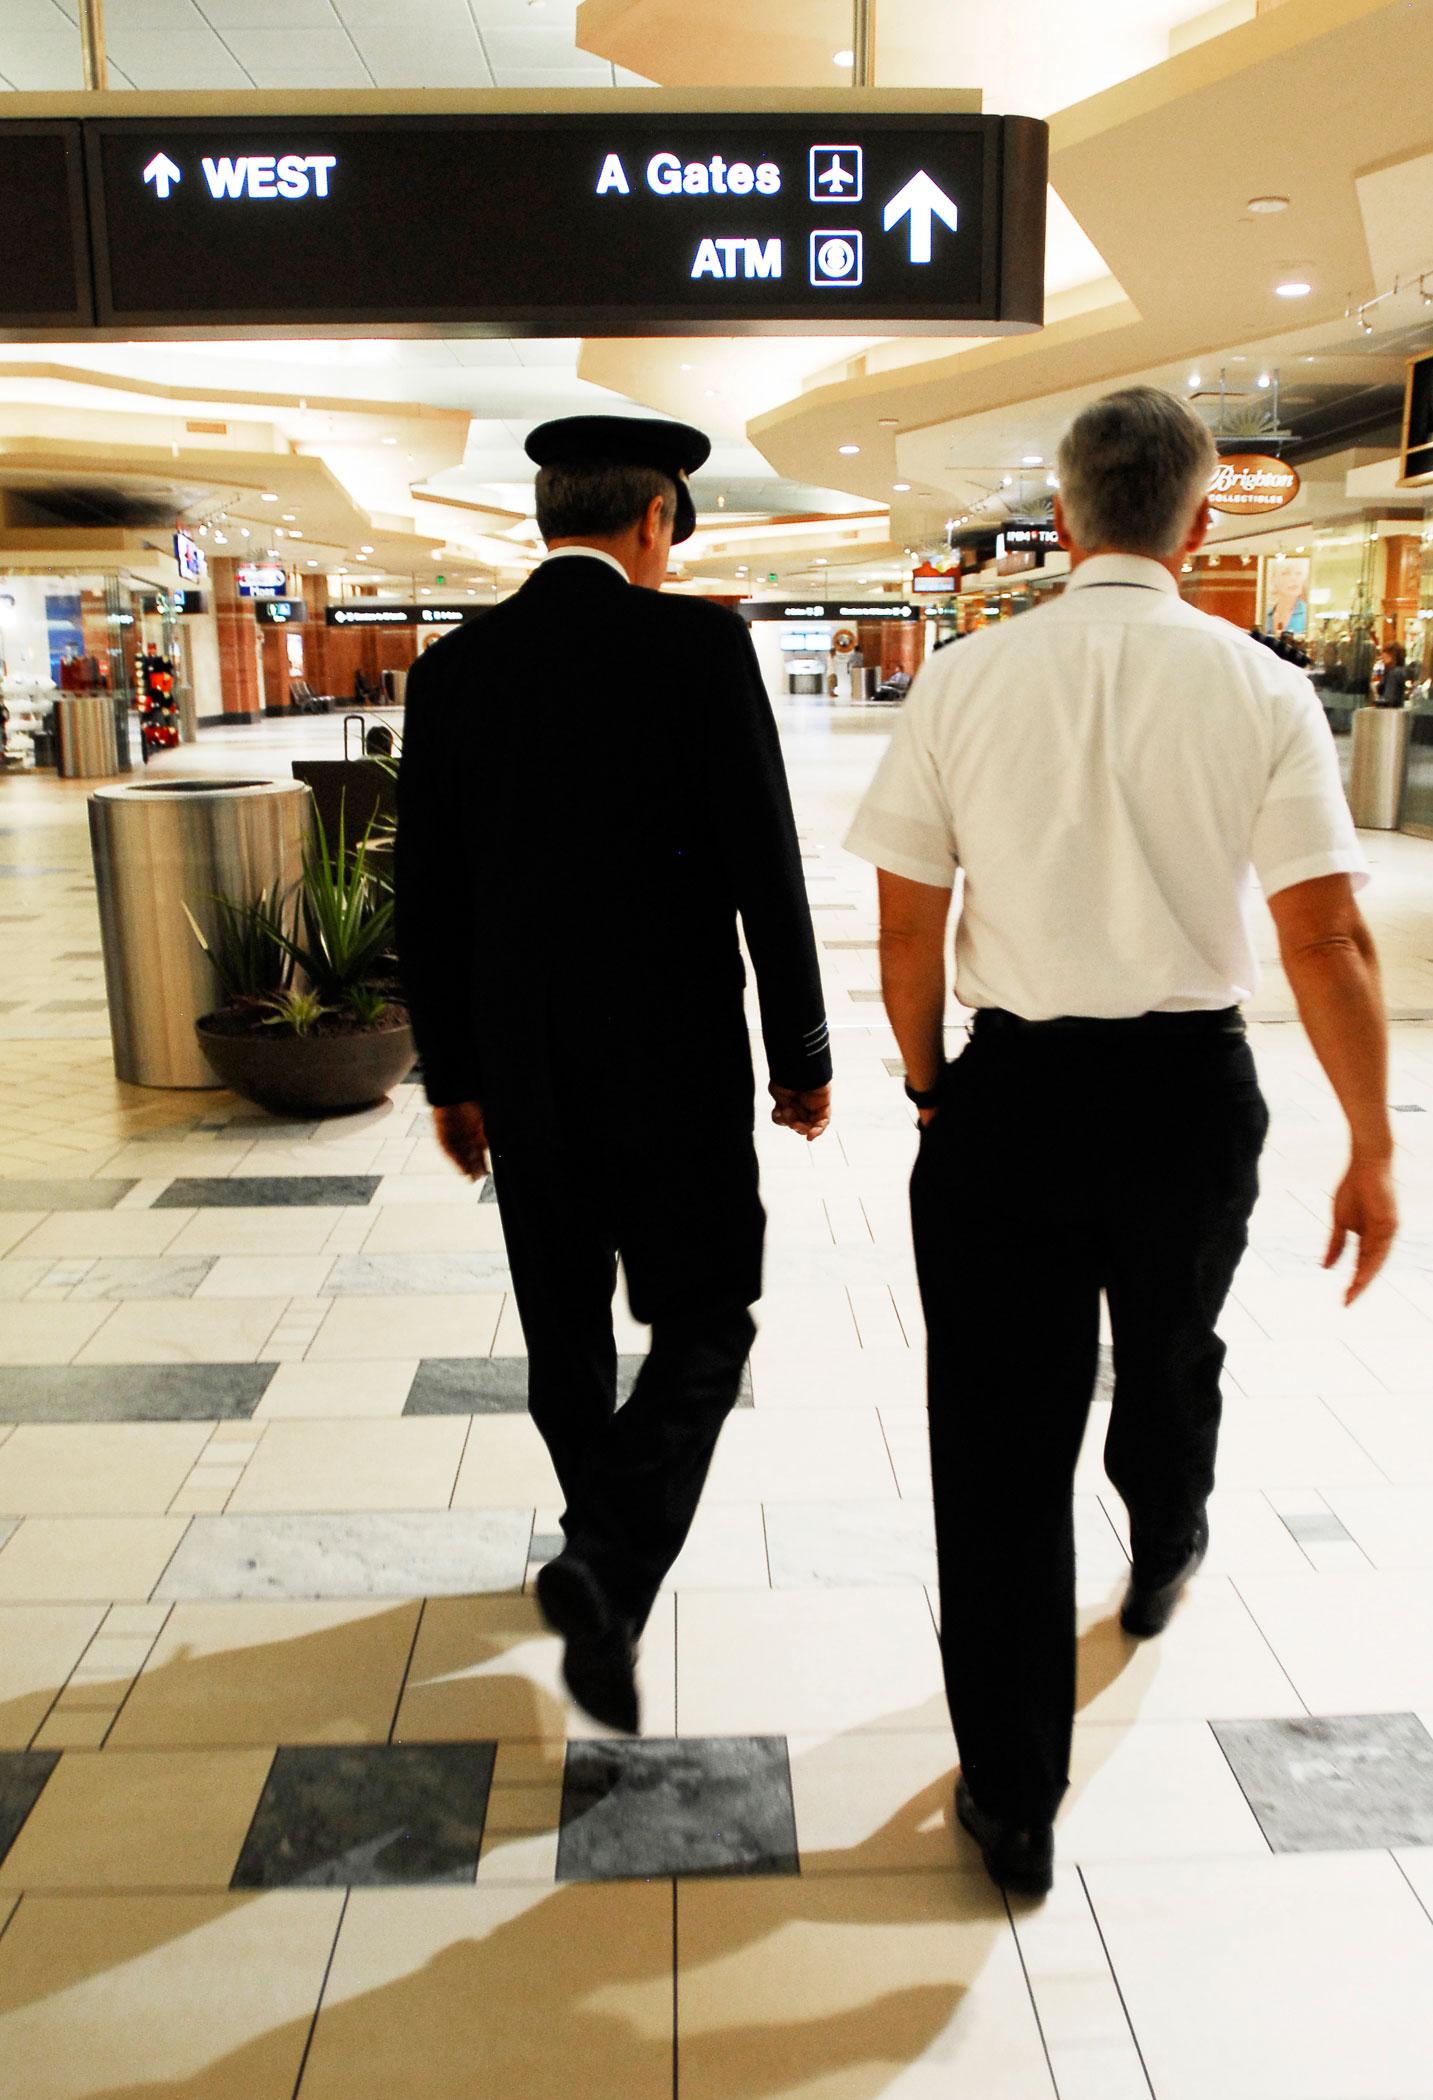 pilot shortage may develop as job loses luster